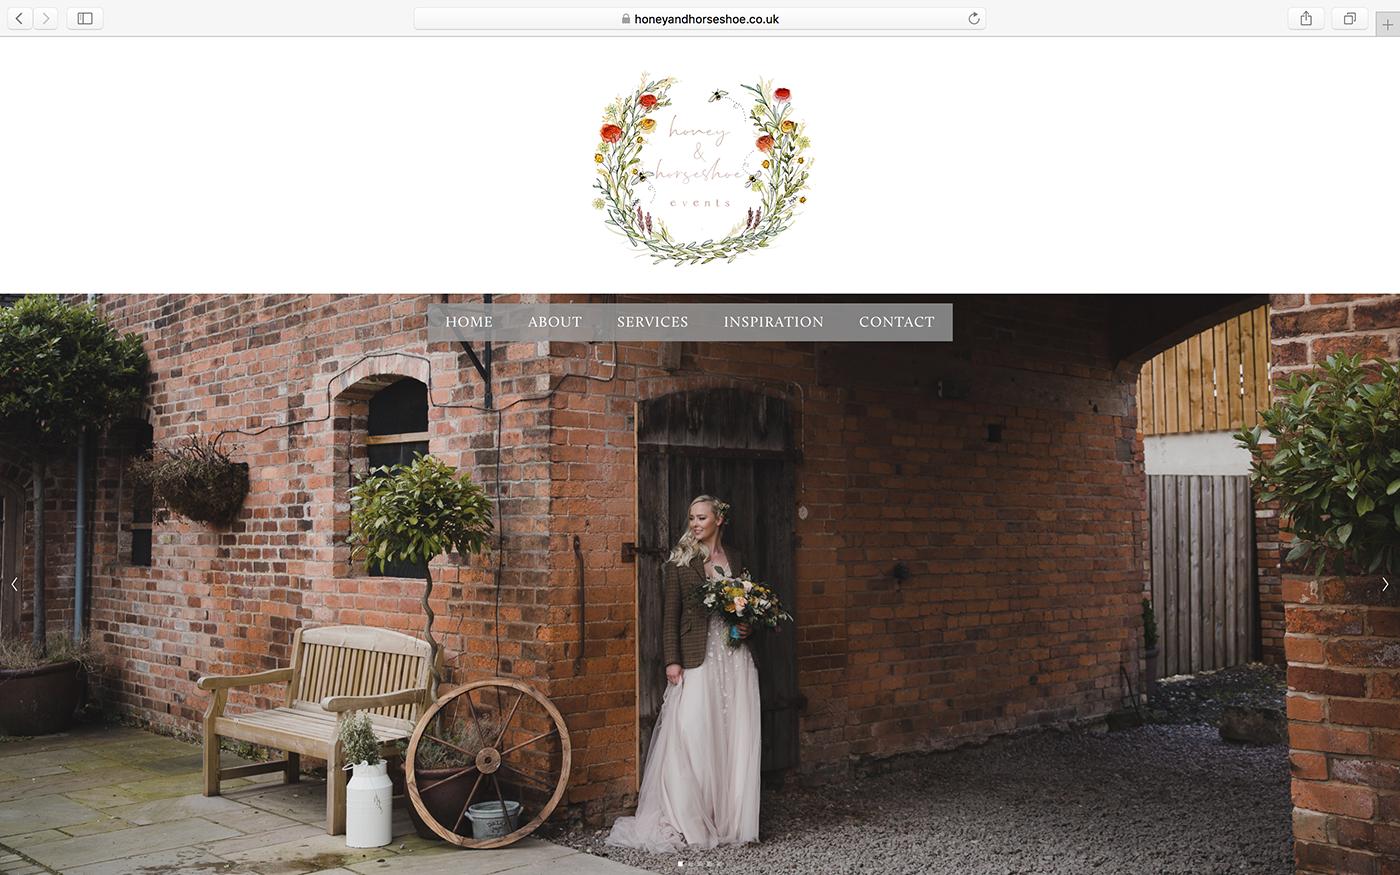 event planners website